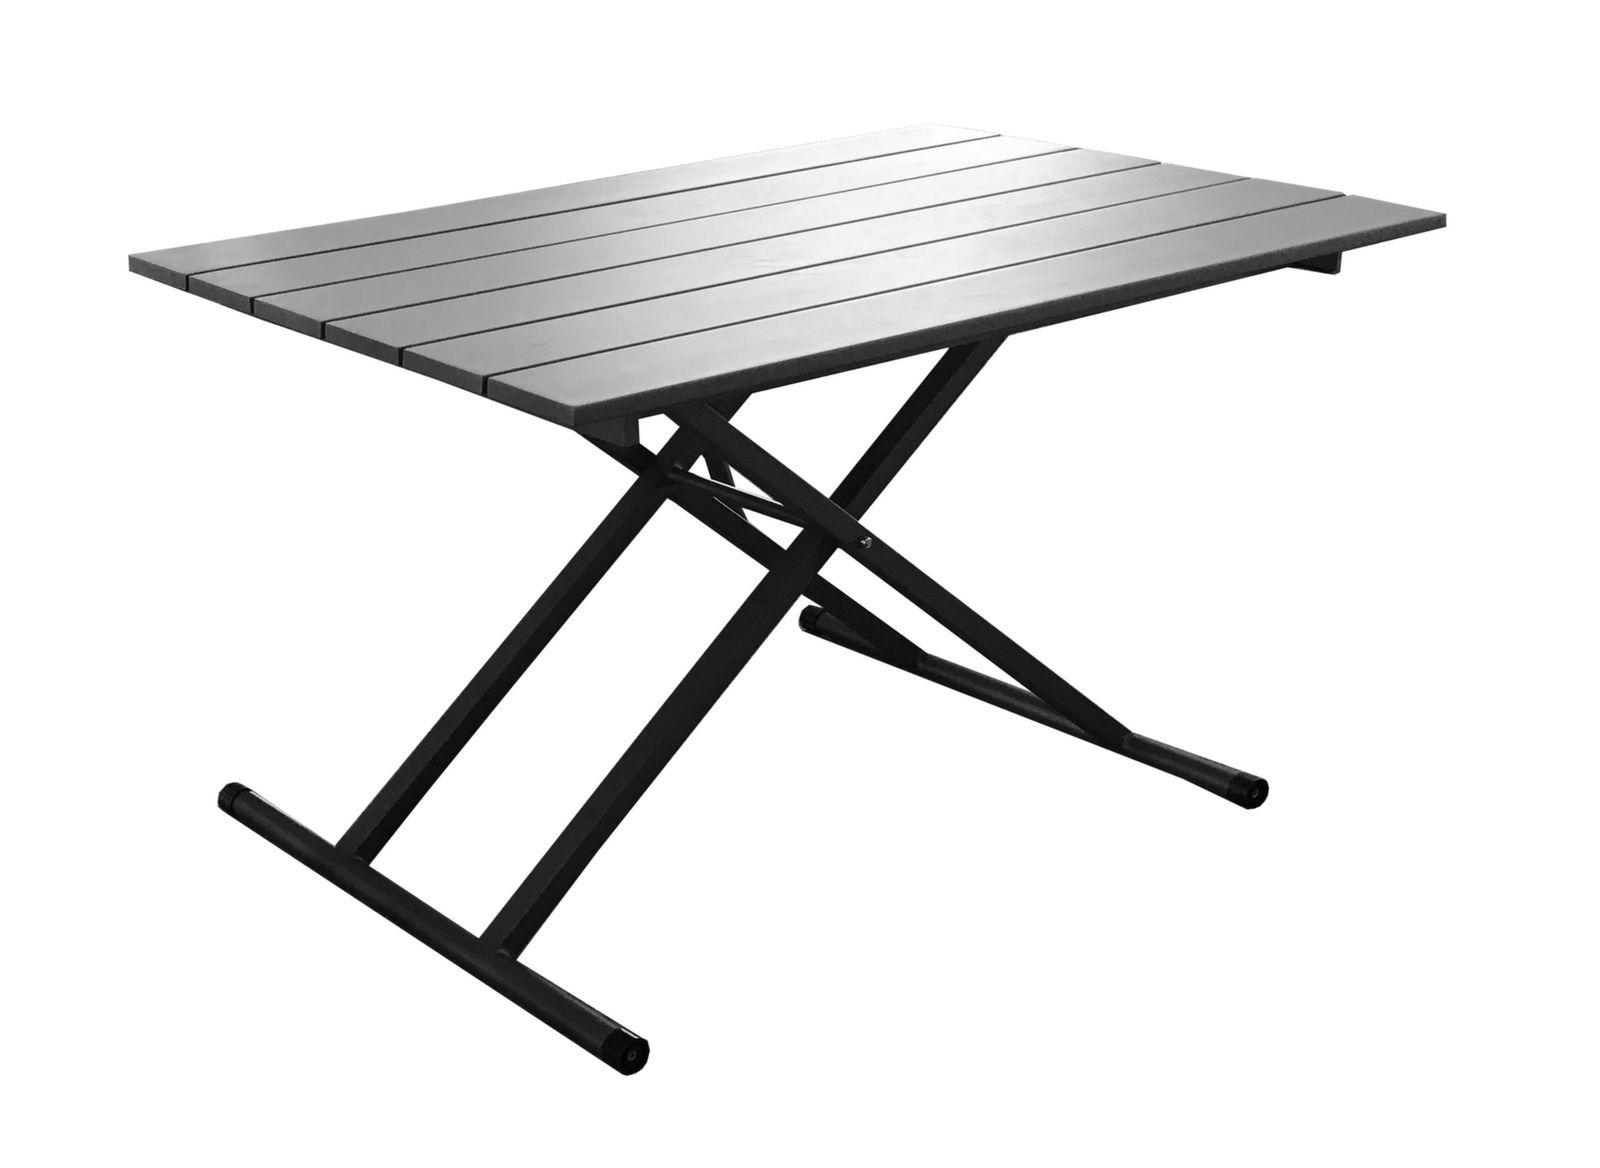 Basses Mobilier Proloisirs Relevable Jardin De Table K3TJlF1c